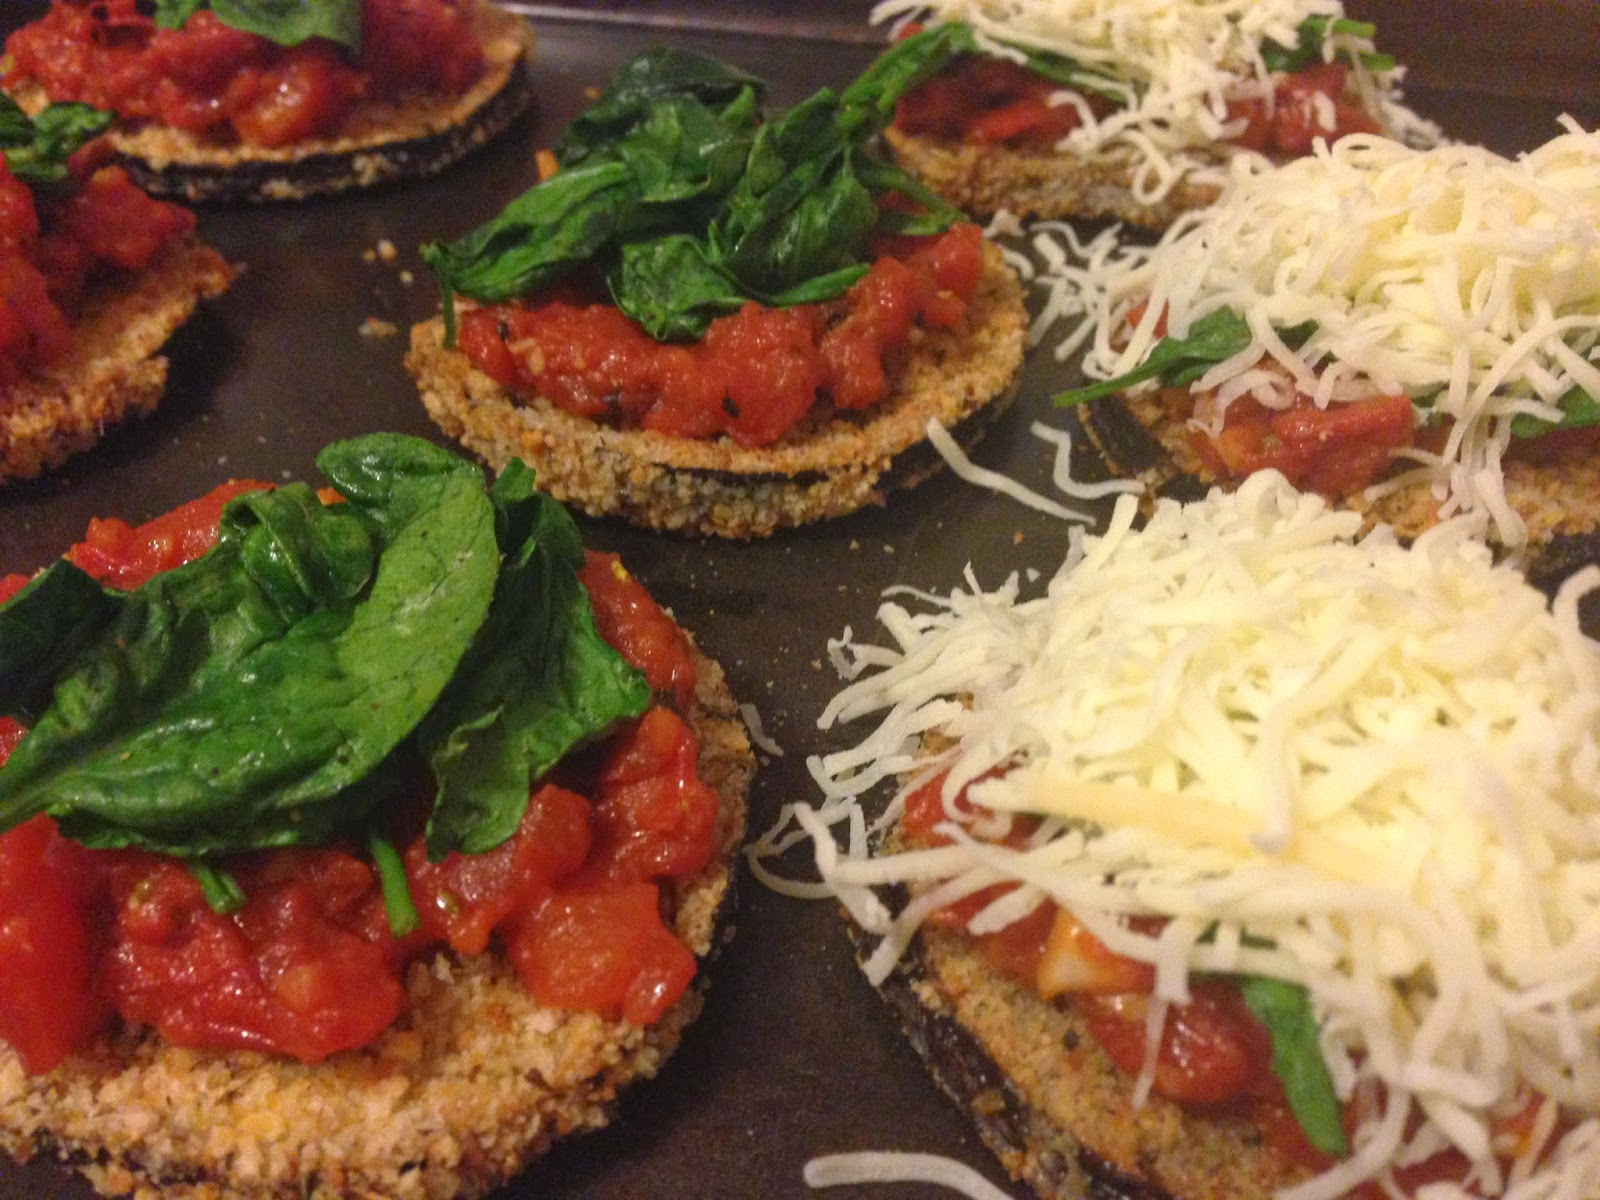 Kara cooks and eats: Eggplant pizza